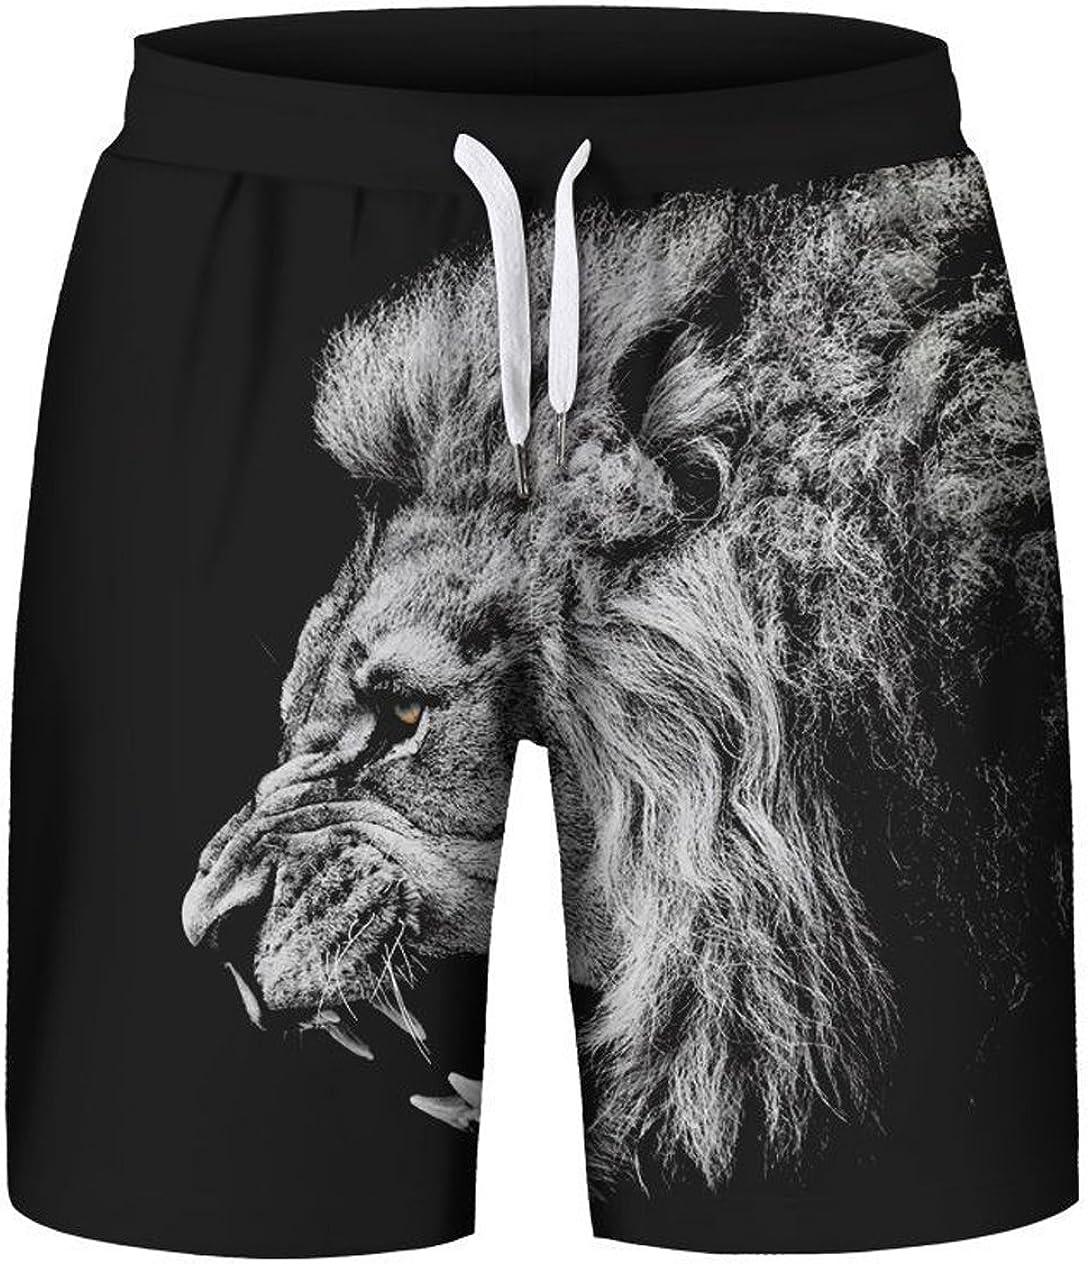 HOP FASHION Unisex Print Drawstring Shorts Summer Beach Baskestball Pants